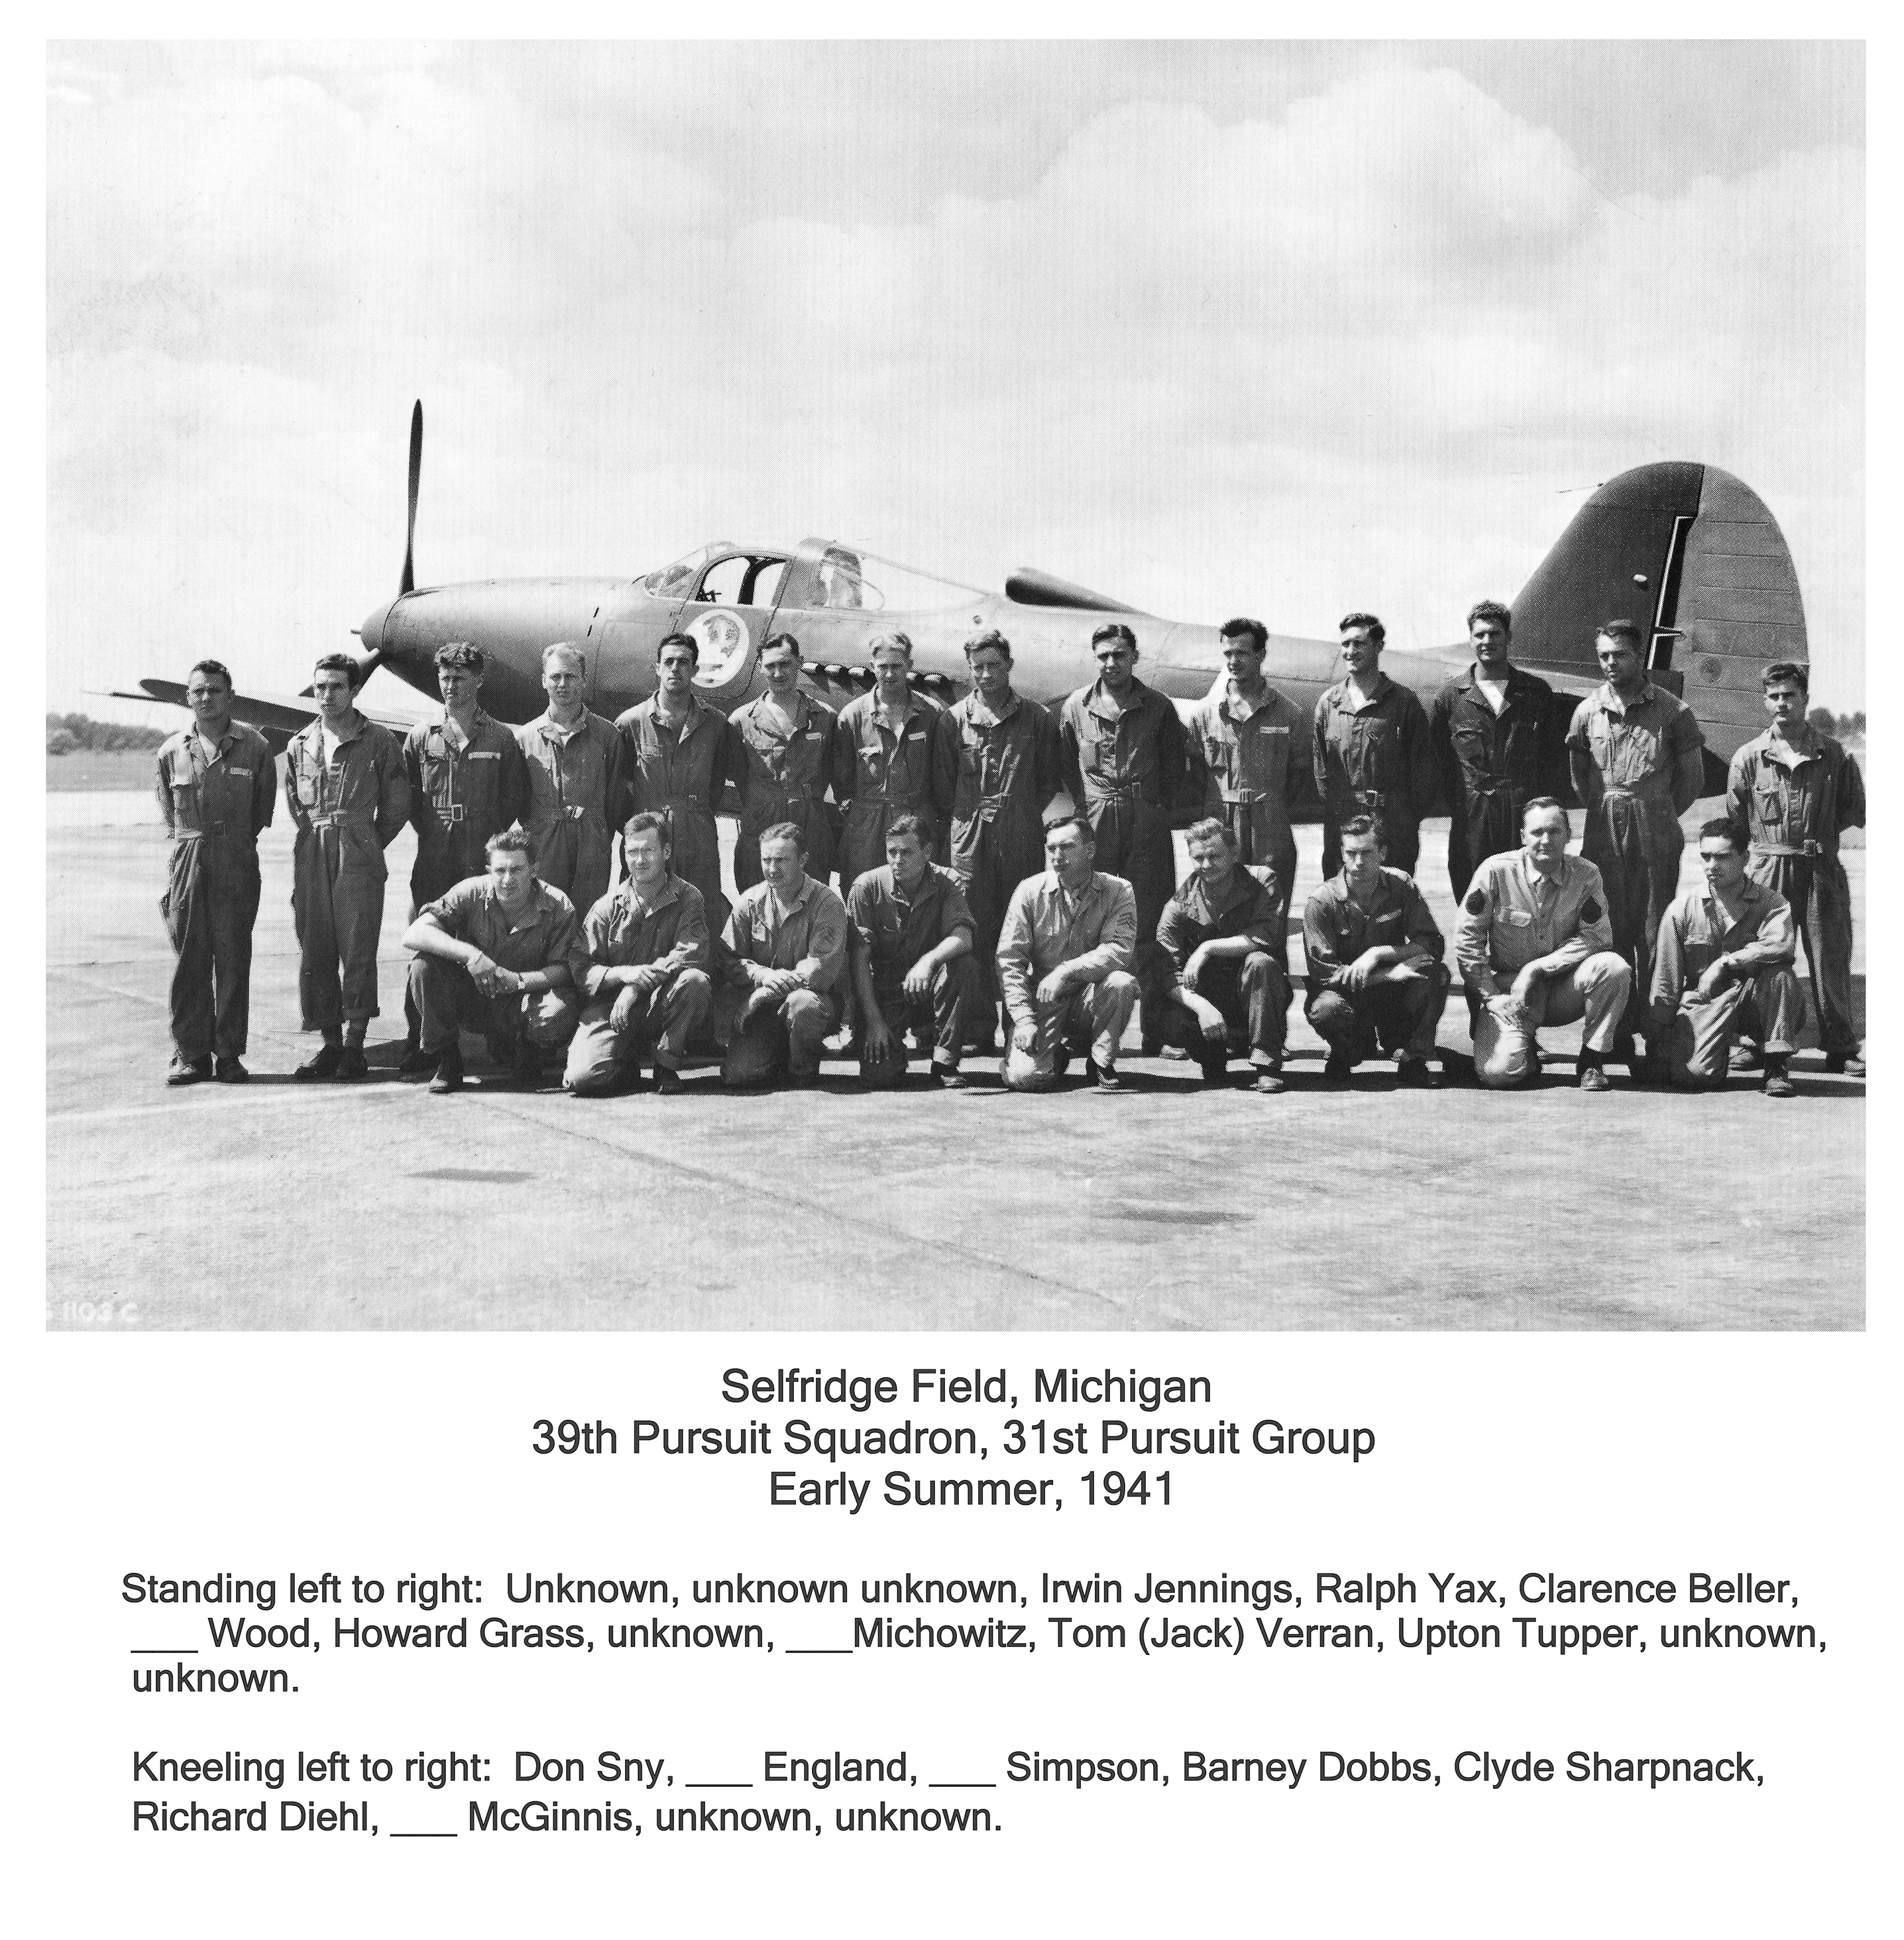 aCh_03_C_19410599-39th PS At Selfridge AAB-Early summer 1941 600dpi C.jpg